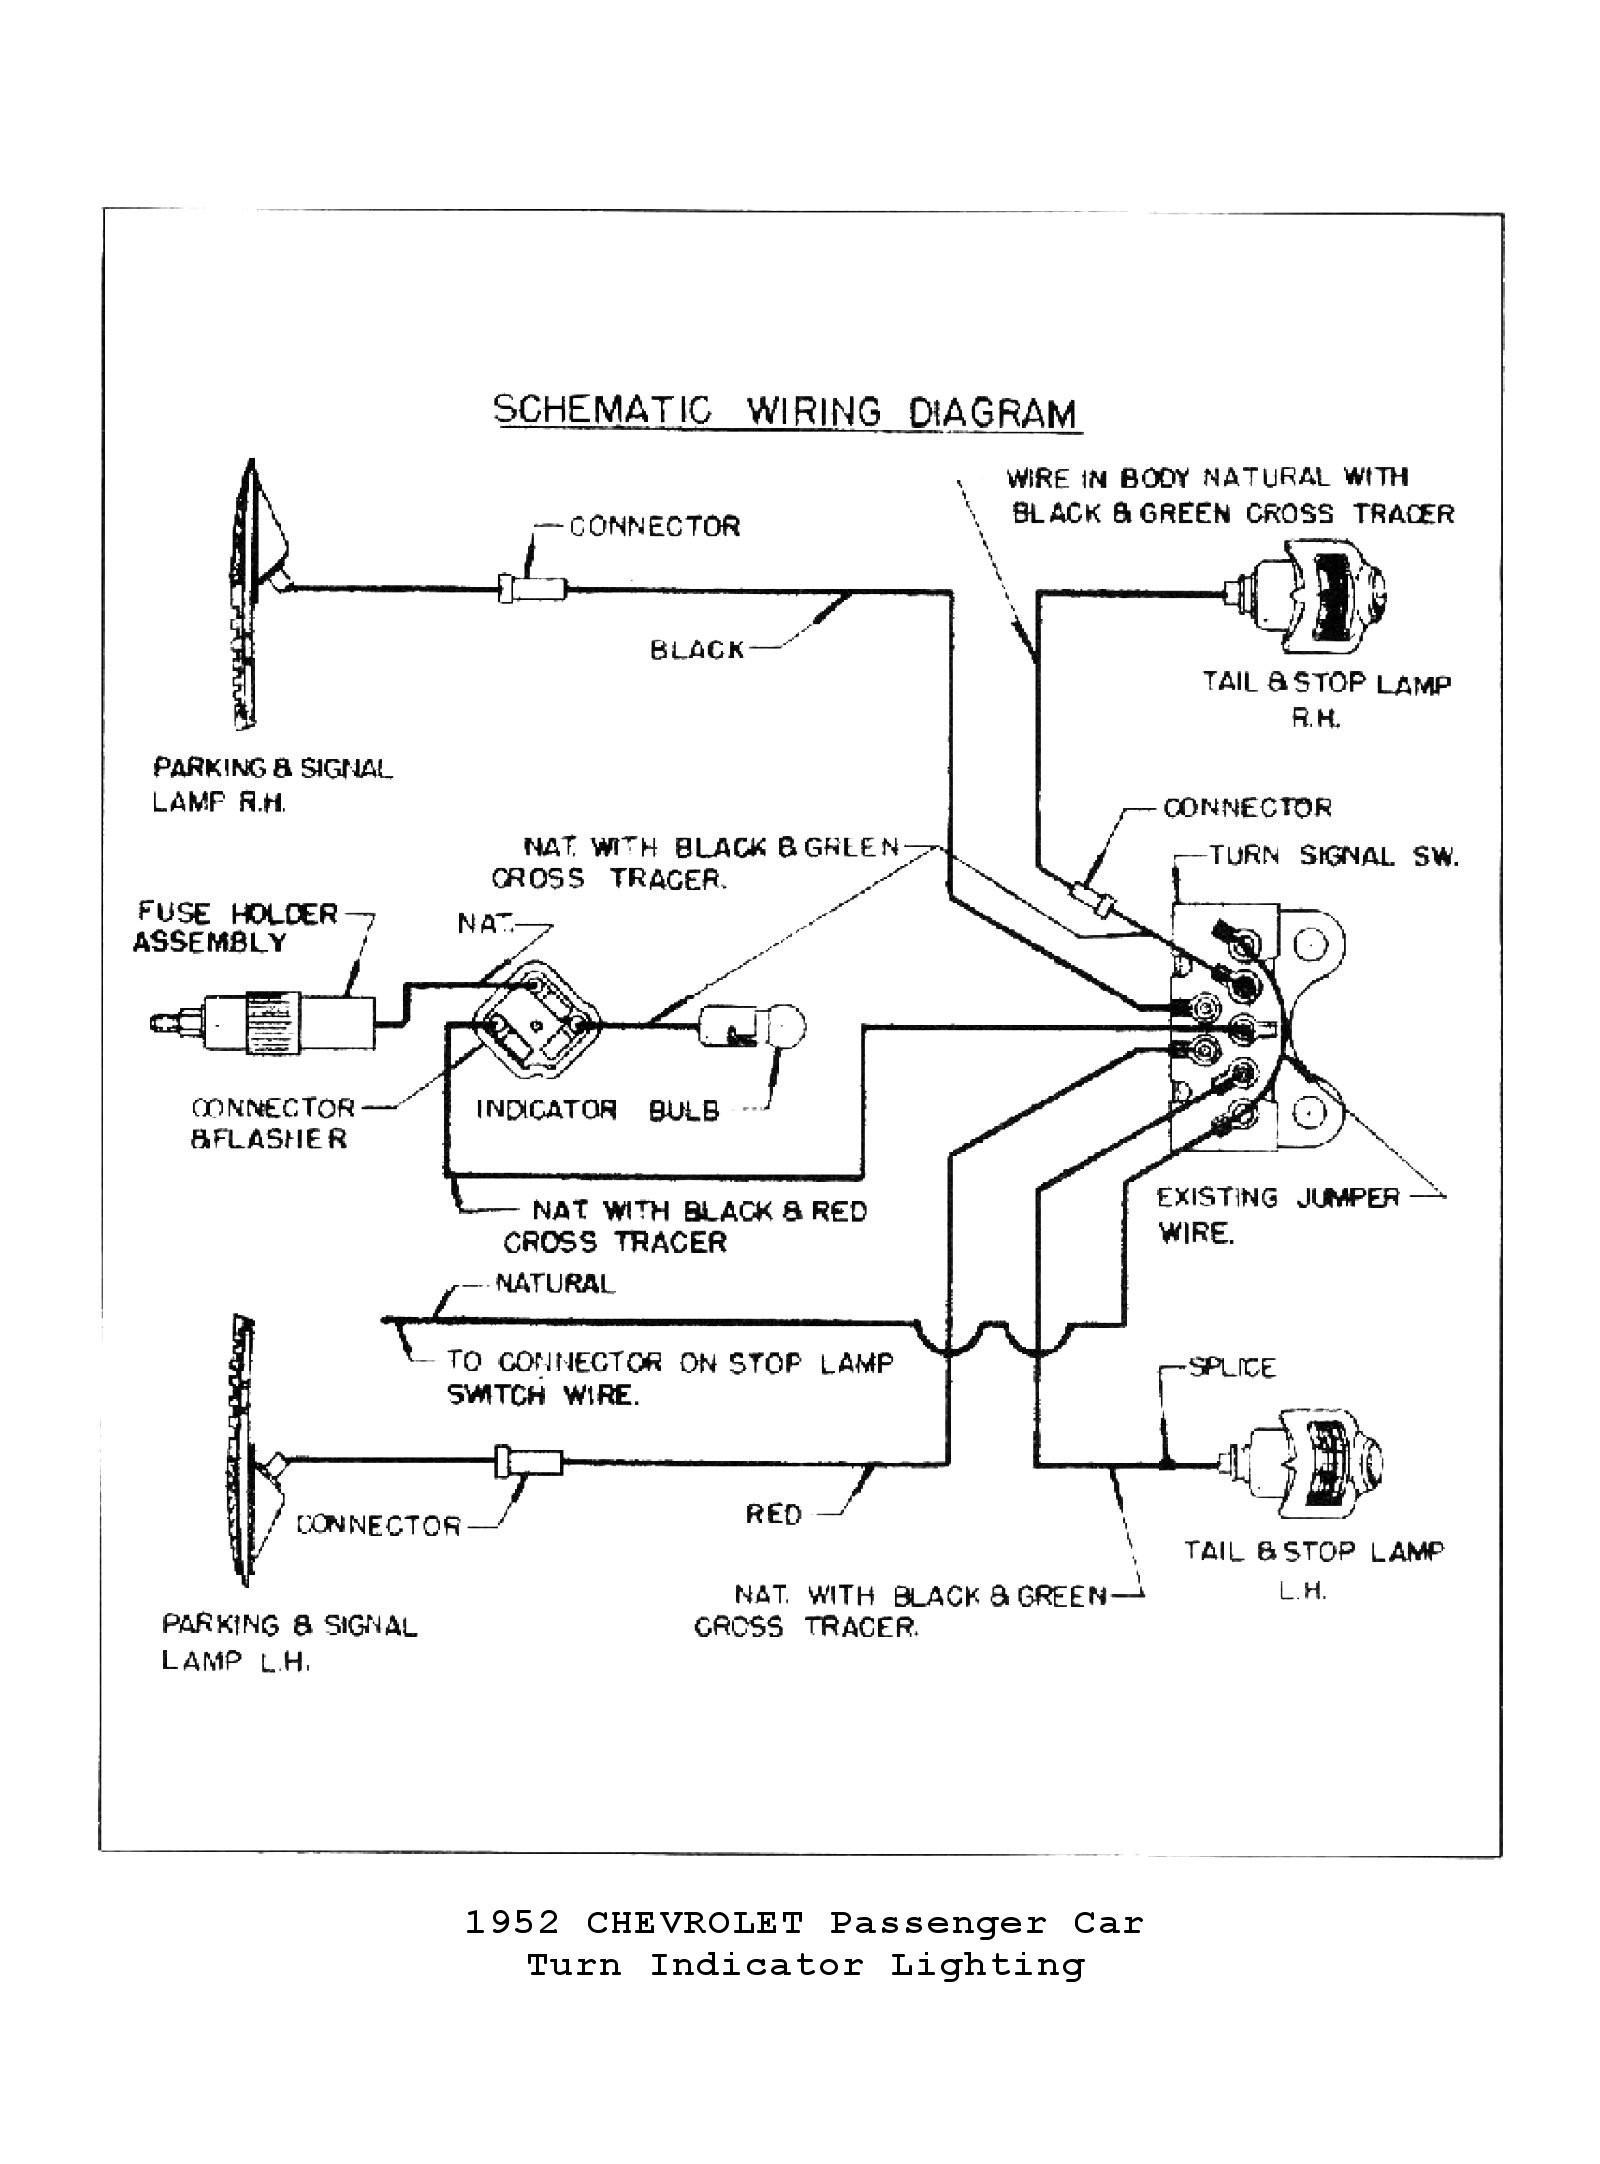 [DIAGRAM_38YU]  EX_6270] With Signal Stat 800 Wiring Diagram In Addition Signal Stat 900  Wiring Schematic Wiring | Vsm 900 Turn Signal Wiring Diagram |  | Stap Egre Mohammedshrine Librar Wiring 101